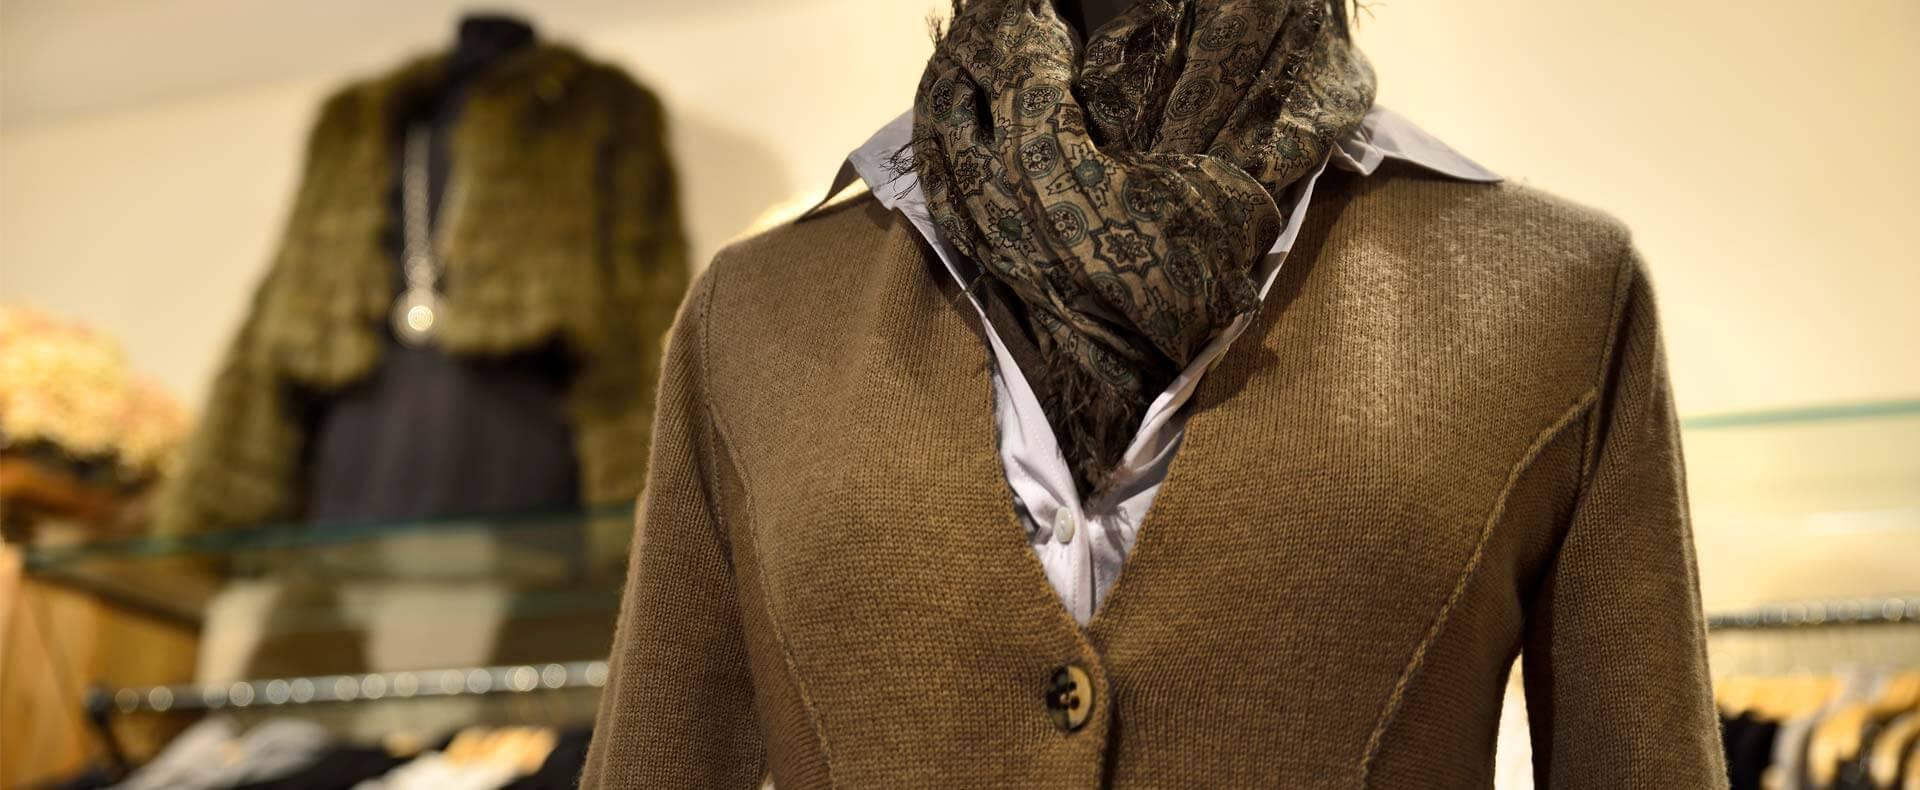 online retailer f1d9d 00434 Zauberhaftes in der Damenboutique Zweite Haut - Rosendomizil